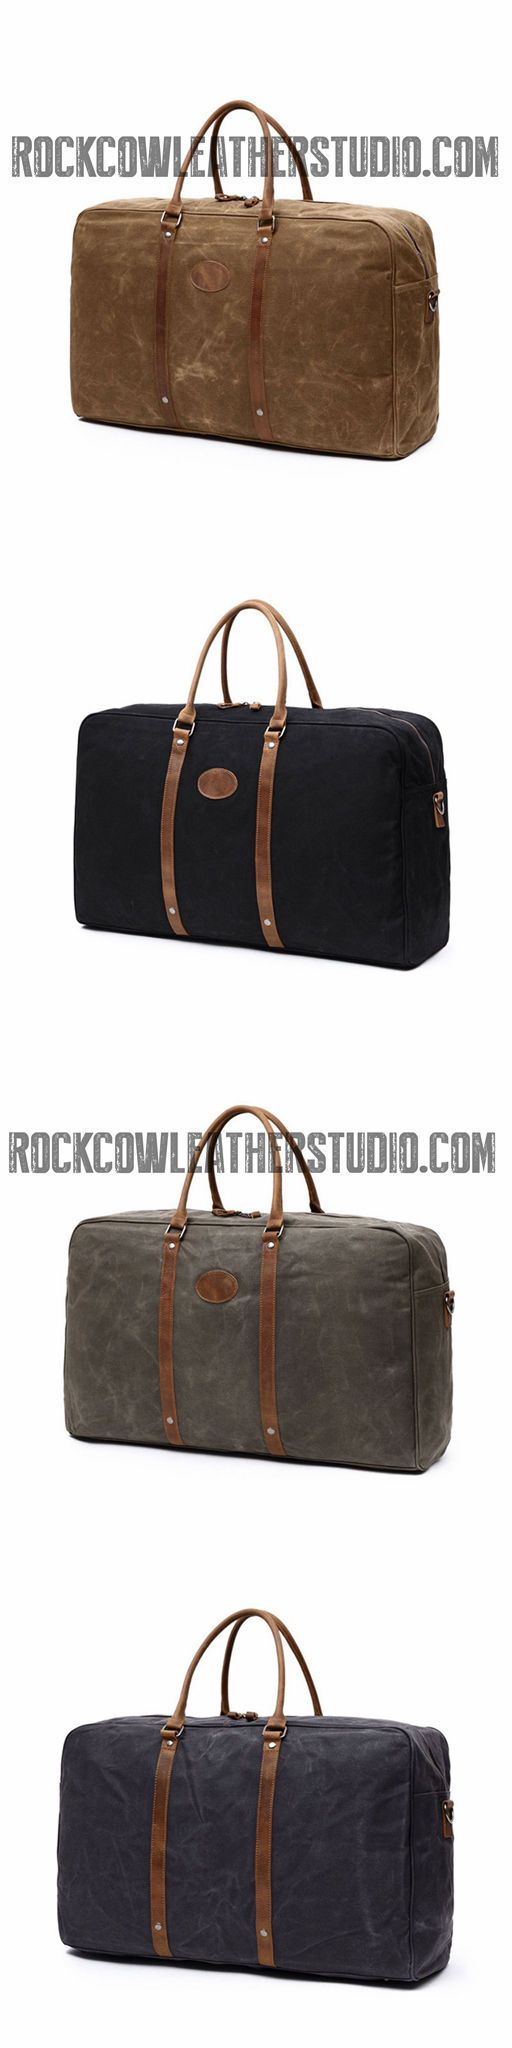 Waxed Canvas Travel bag, Sample Design Weekend Overnight Bag, Gym Bag FX001